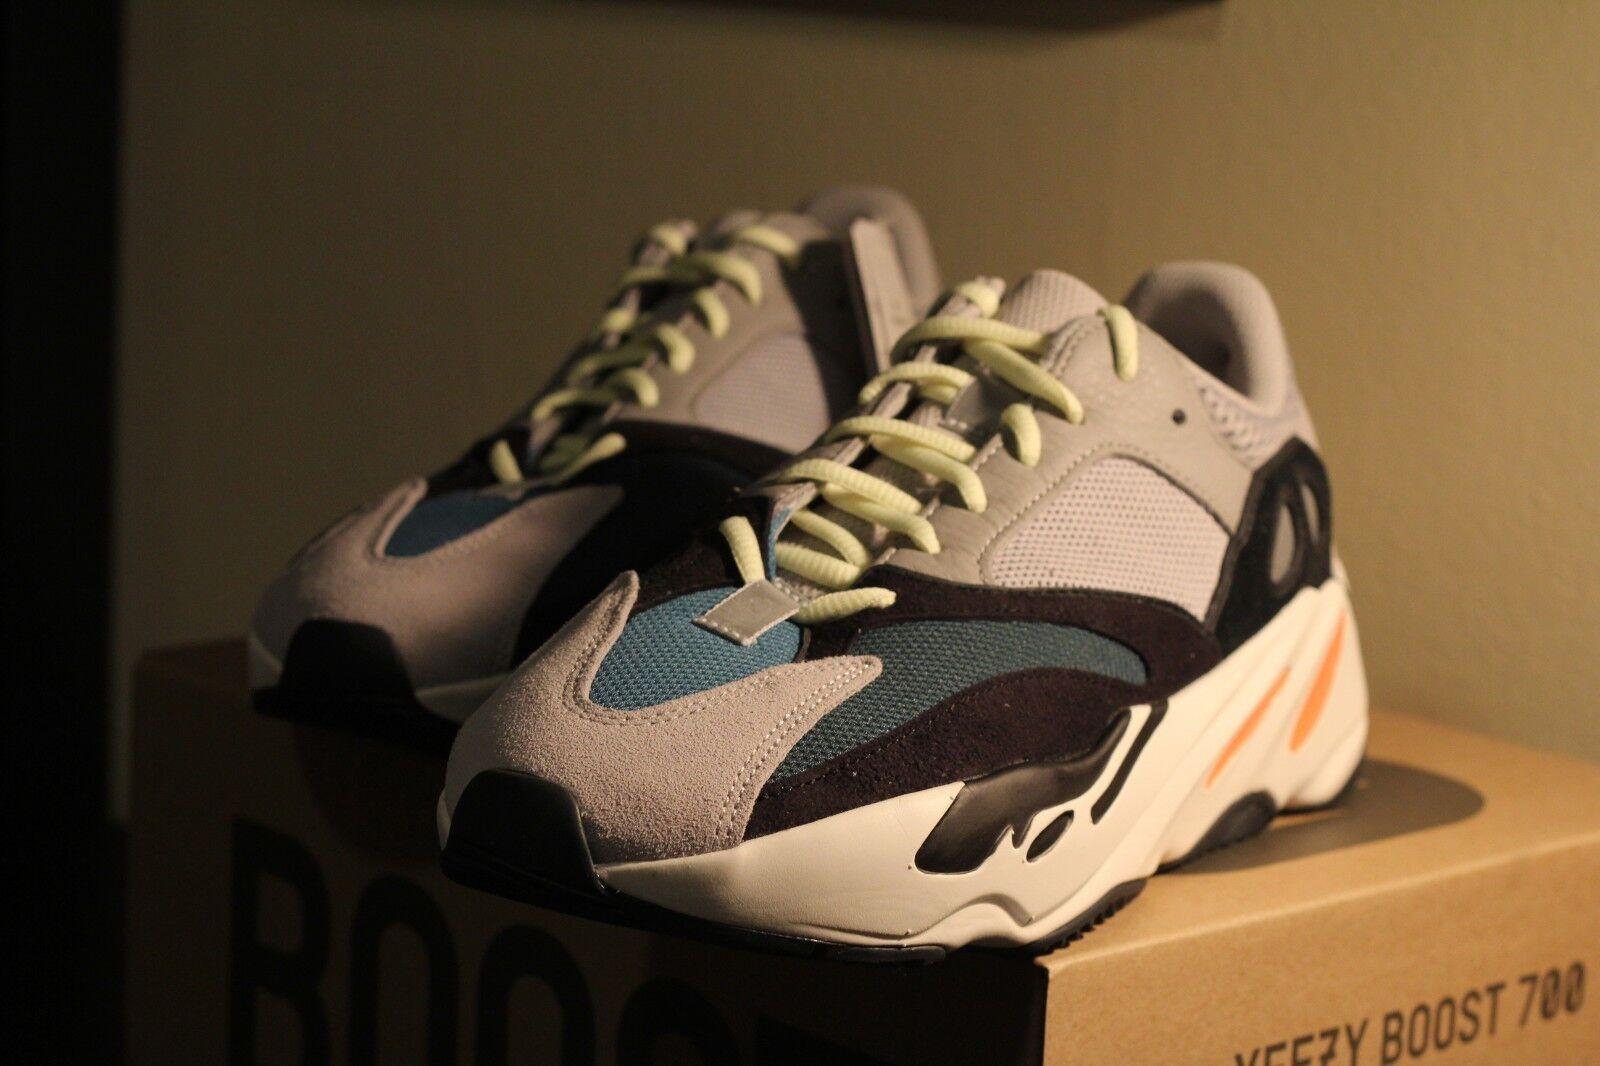 Adidas yeezy 700 größe 10 welle welle welle läufer 8d71be